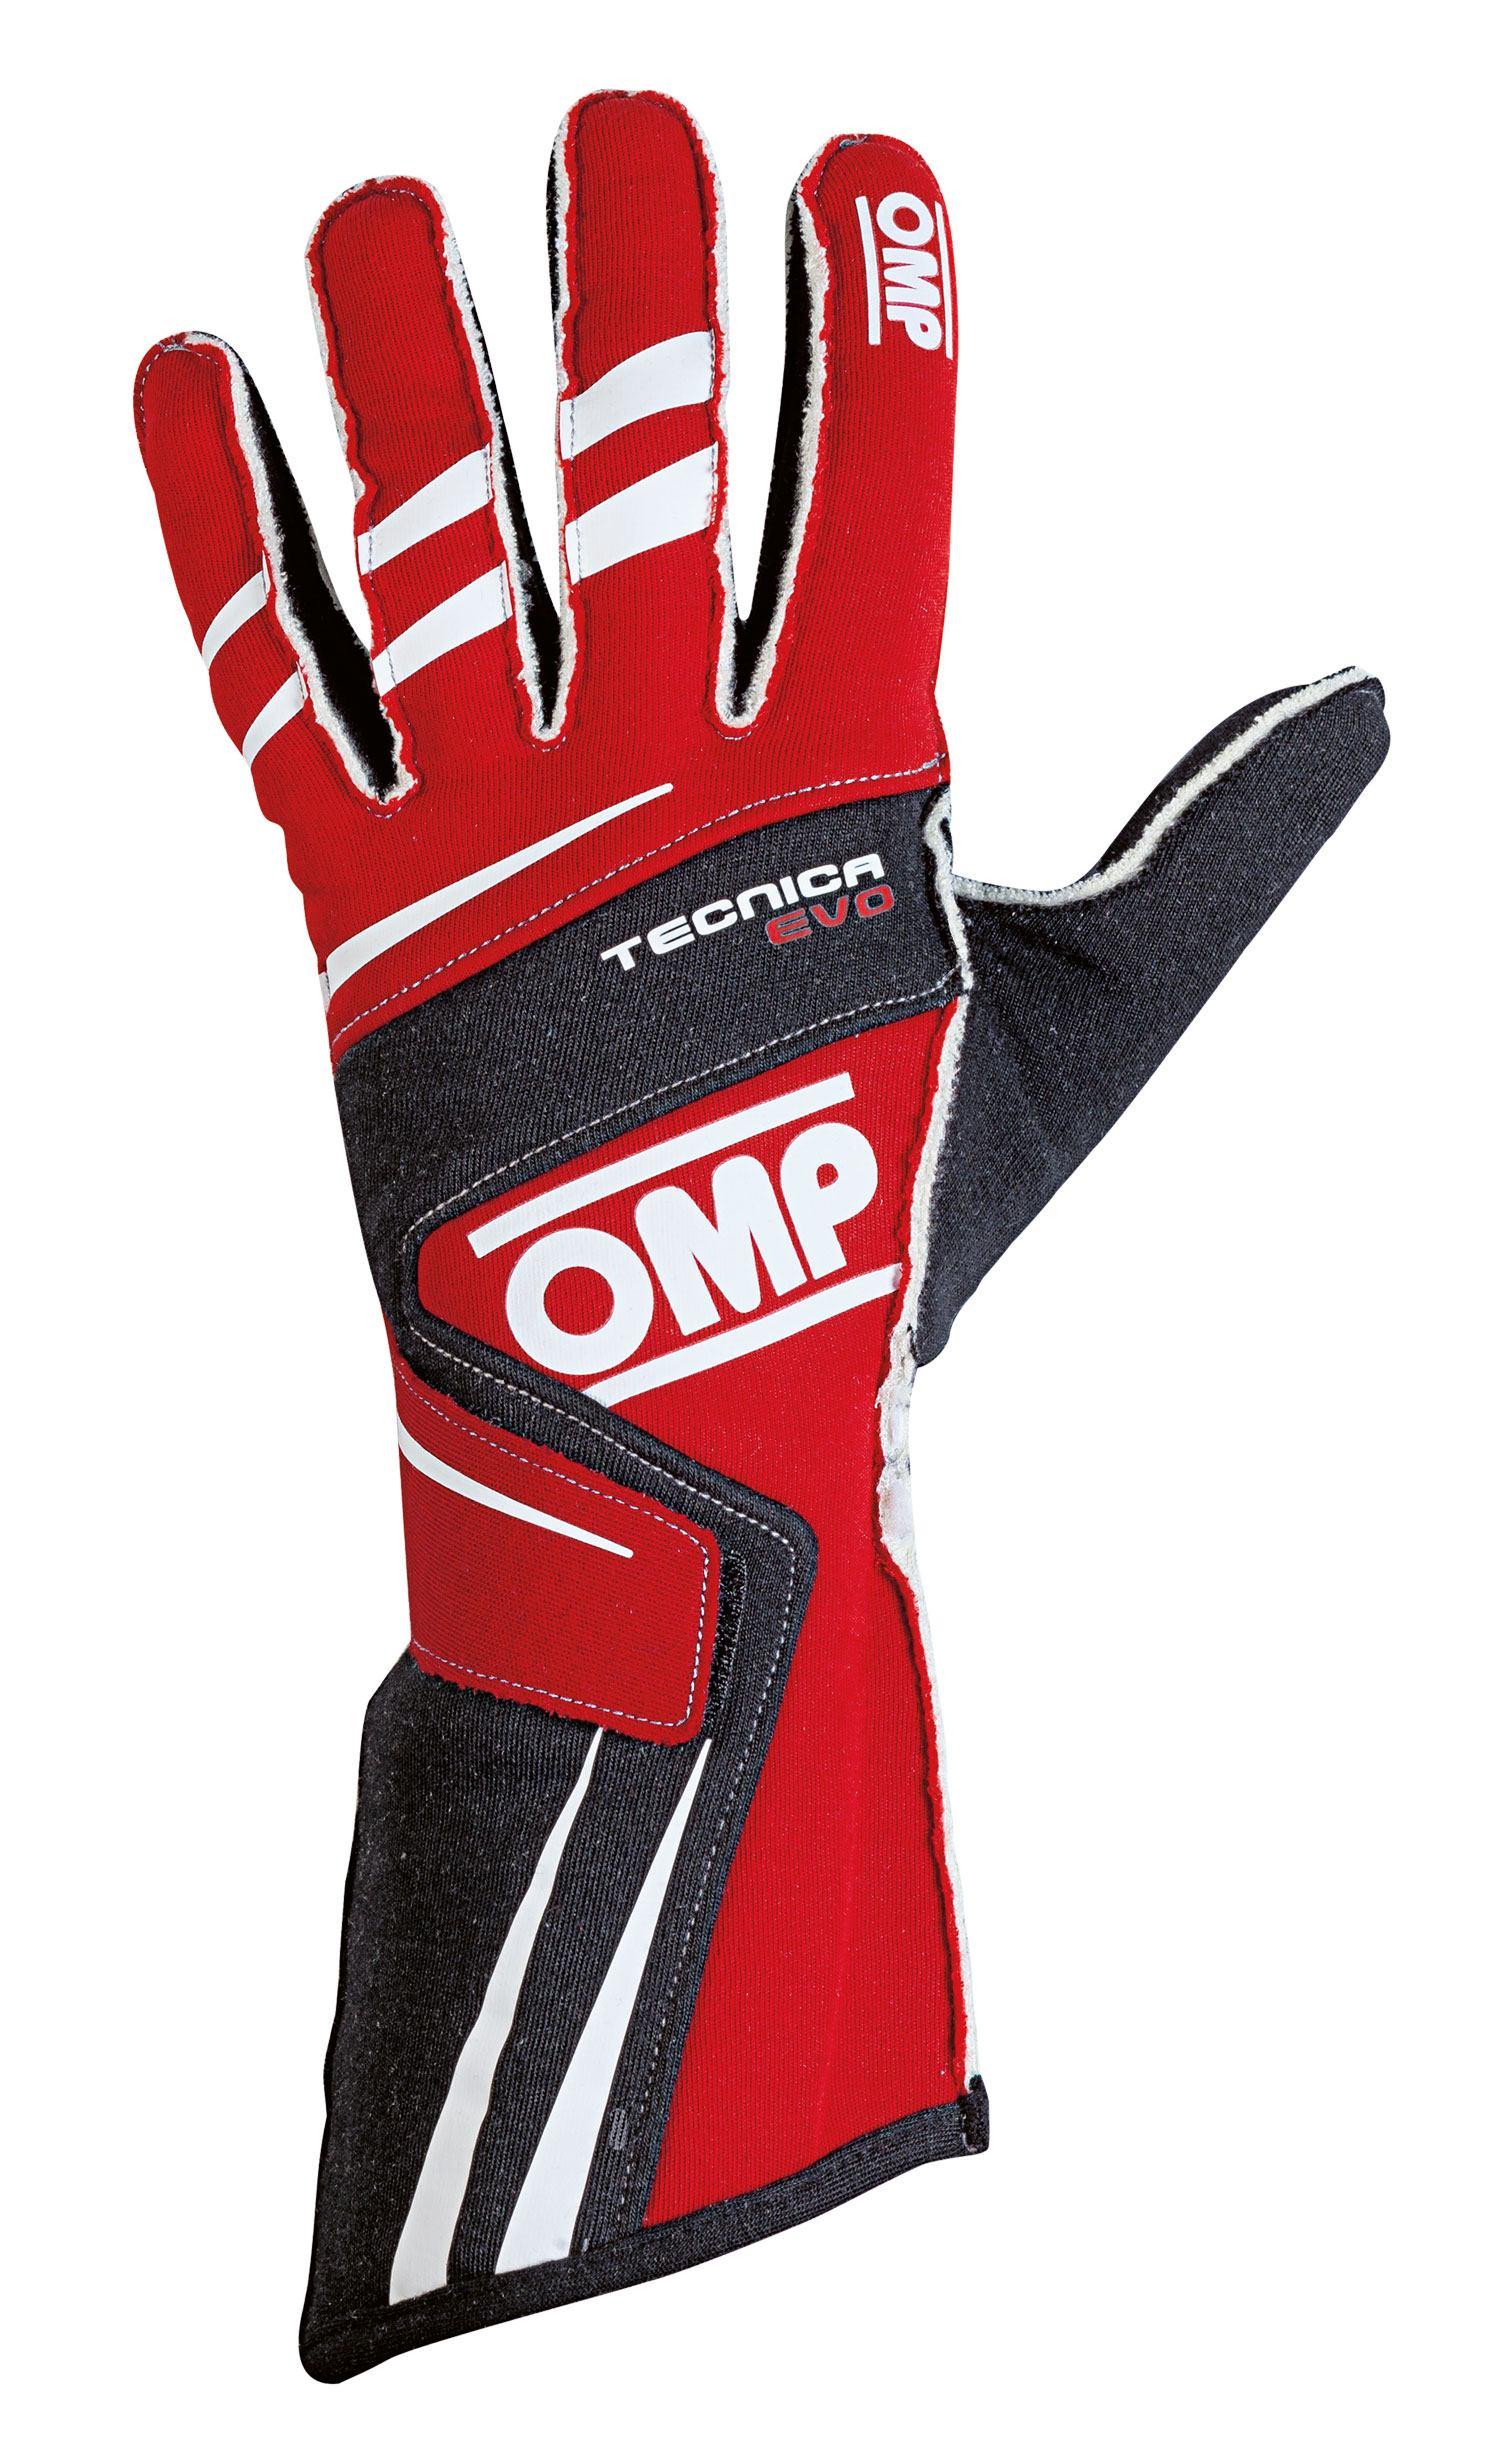 OMP Fahrerhandschuh Tecnica Evo, rot/schwarz